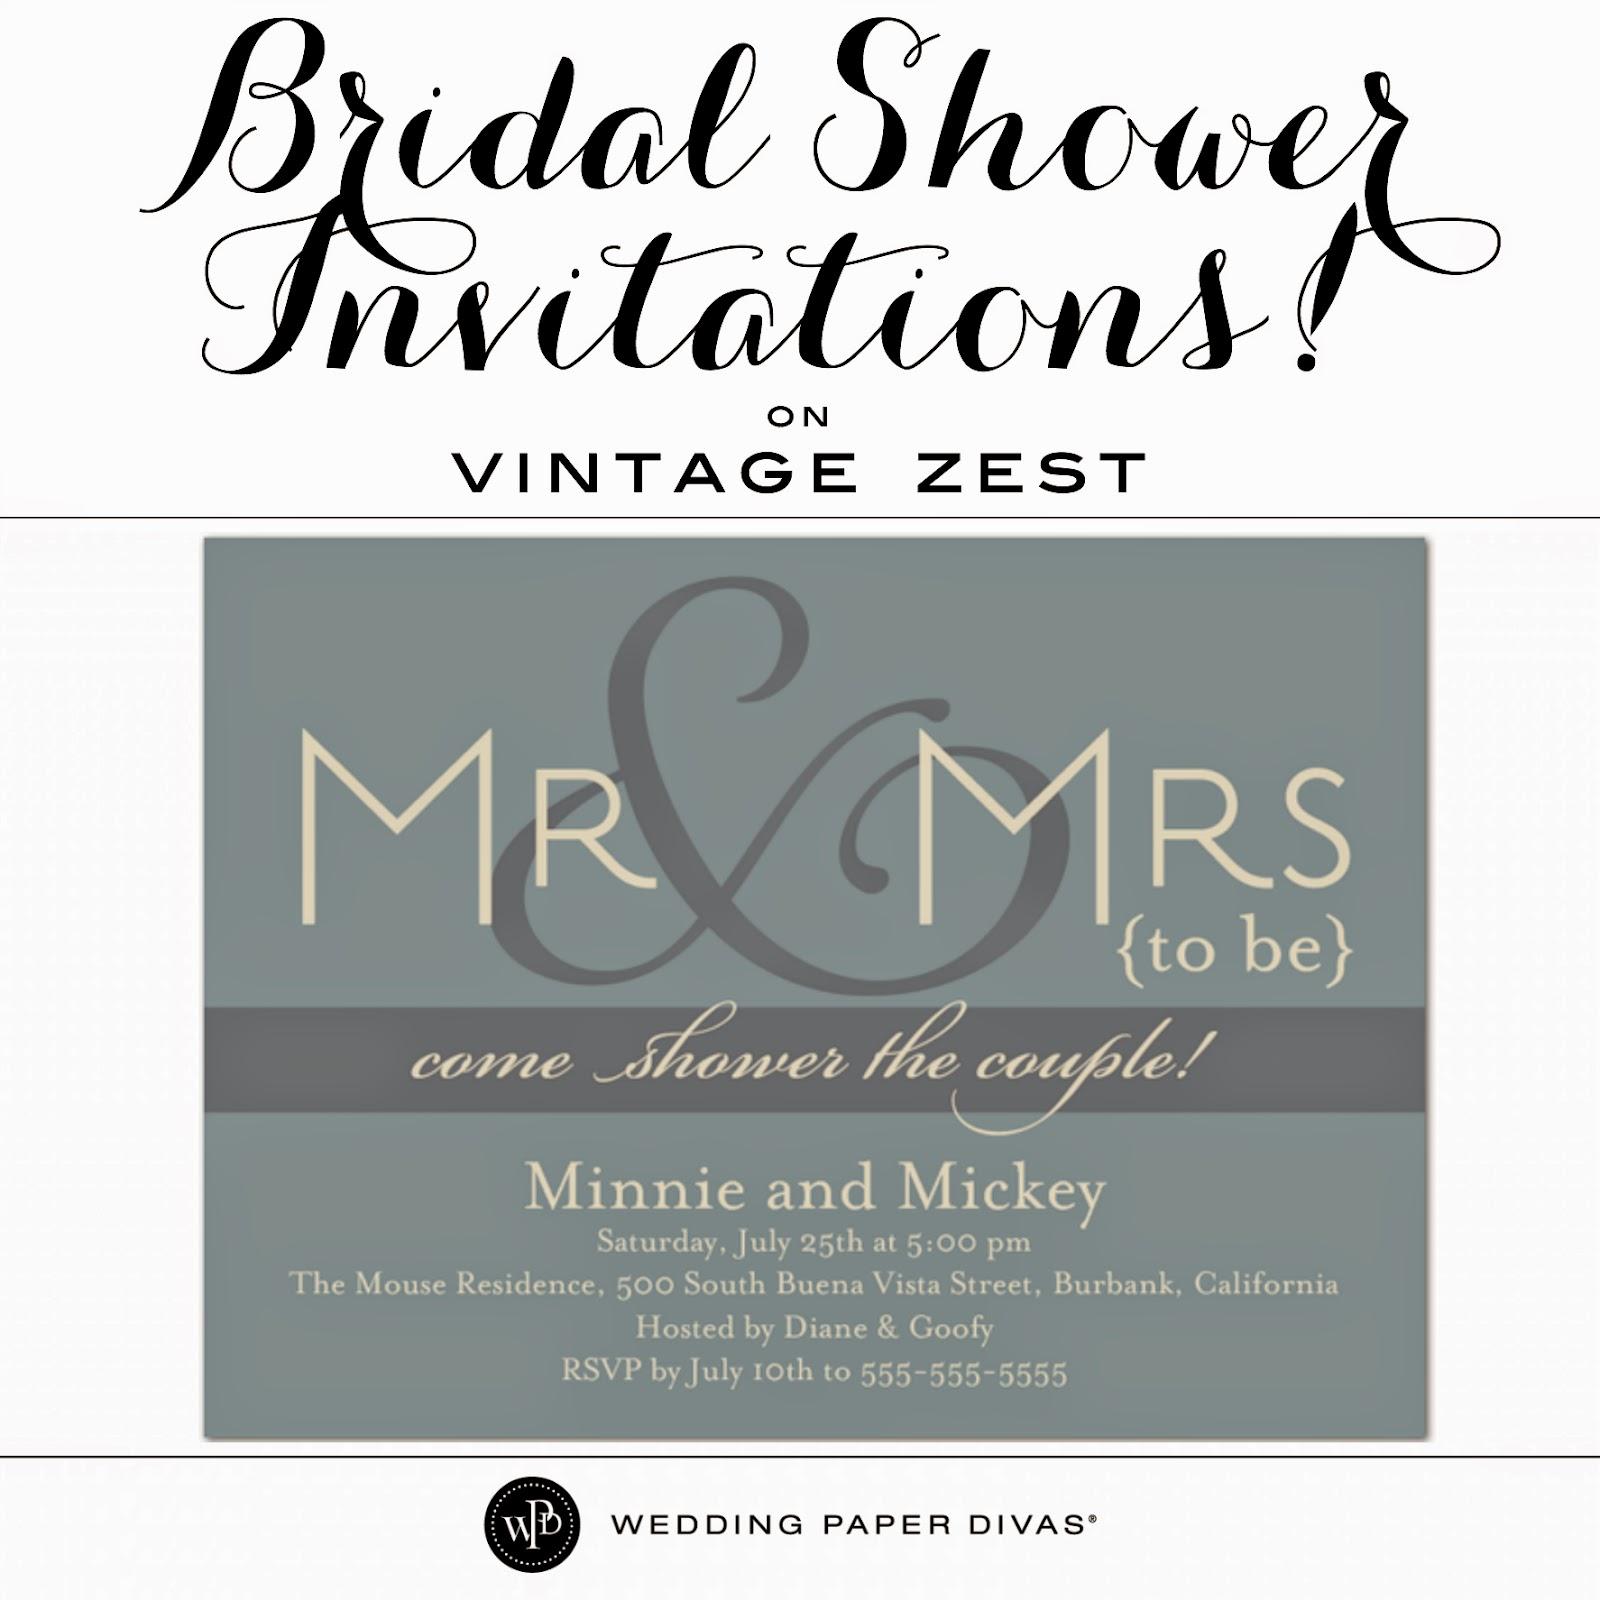 Bridal Shower Invitations with Wedding Paper Divas Dianes Vintage